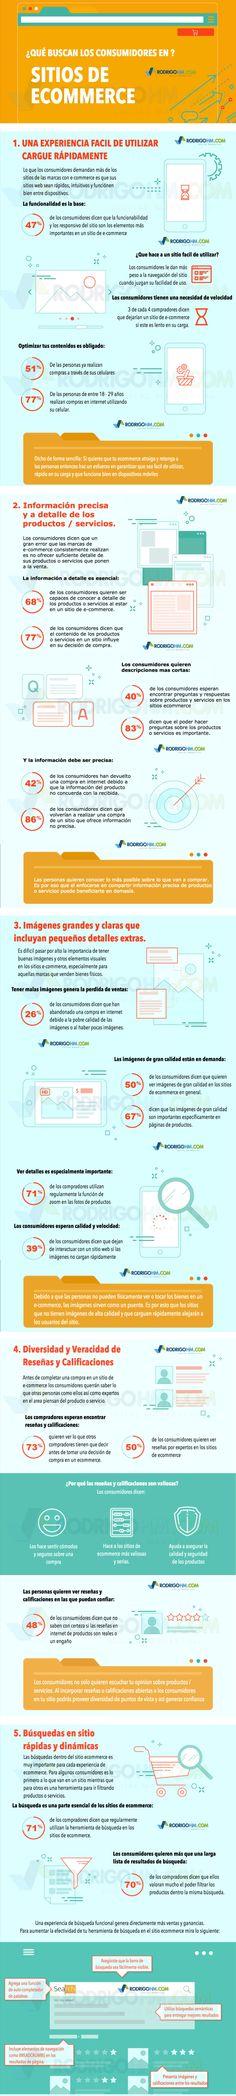 Qué buscan los consumidores en un Commerce #infografia